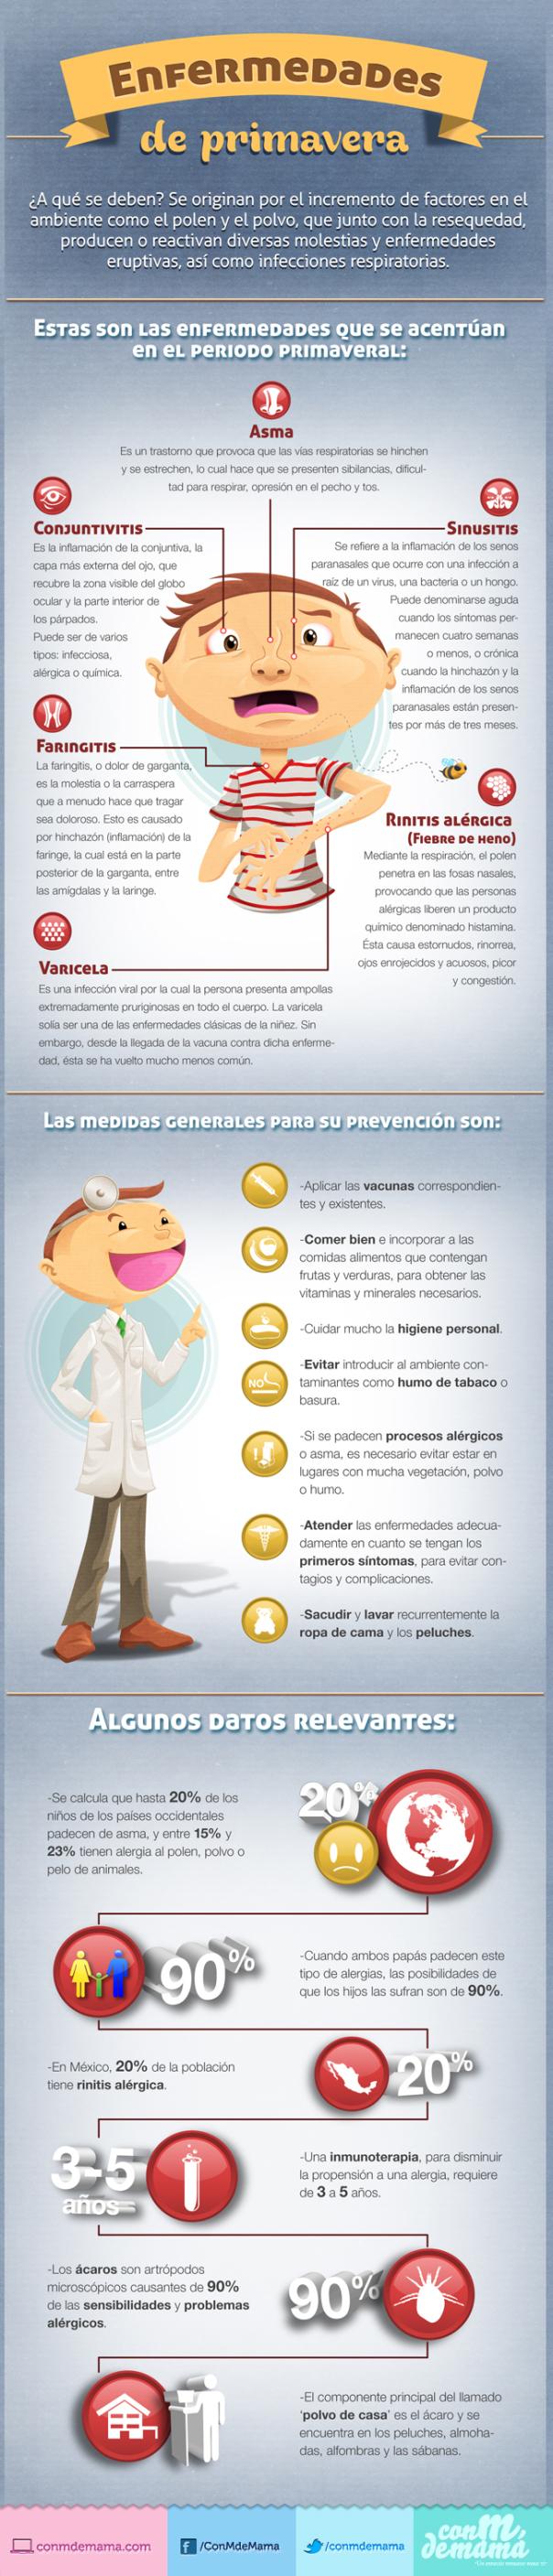 Enfermedades De Primavera Infografia Infographic Health Enfermedades Salud Bucal Enfermedades Cardiovasculares